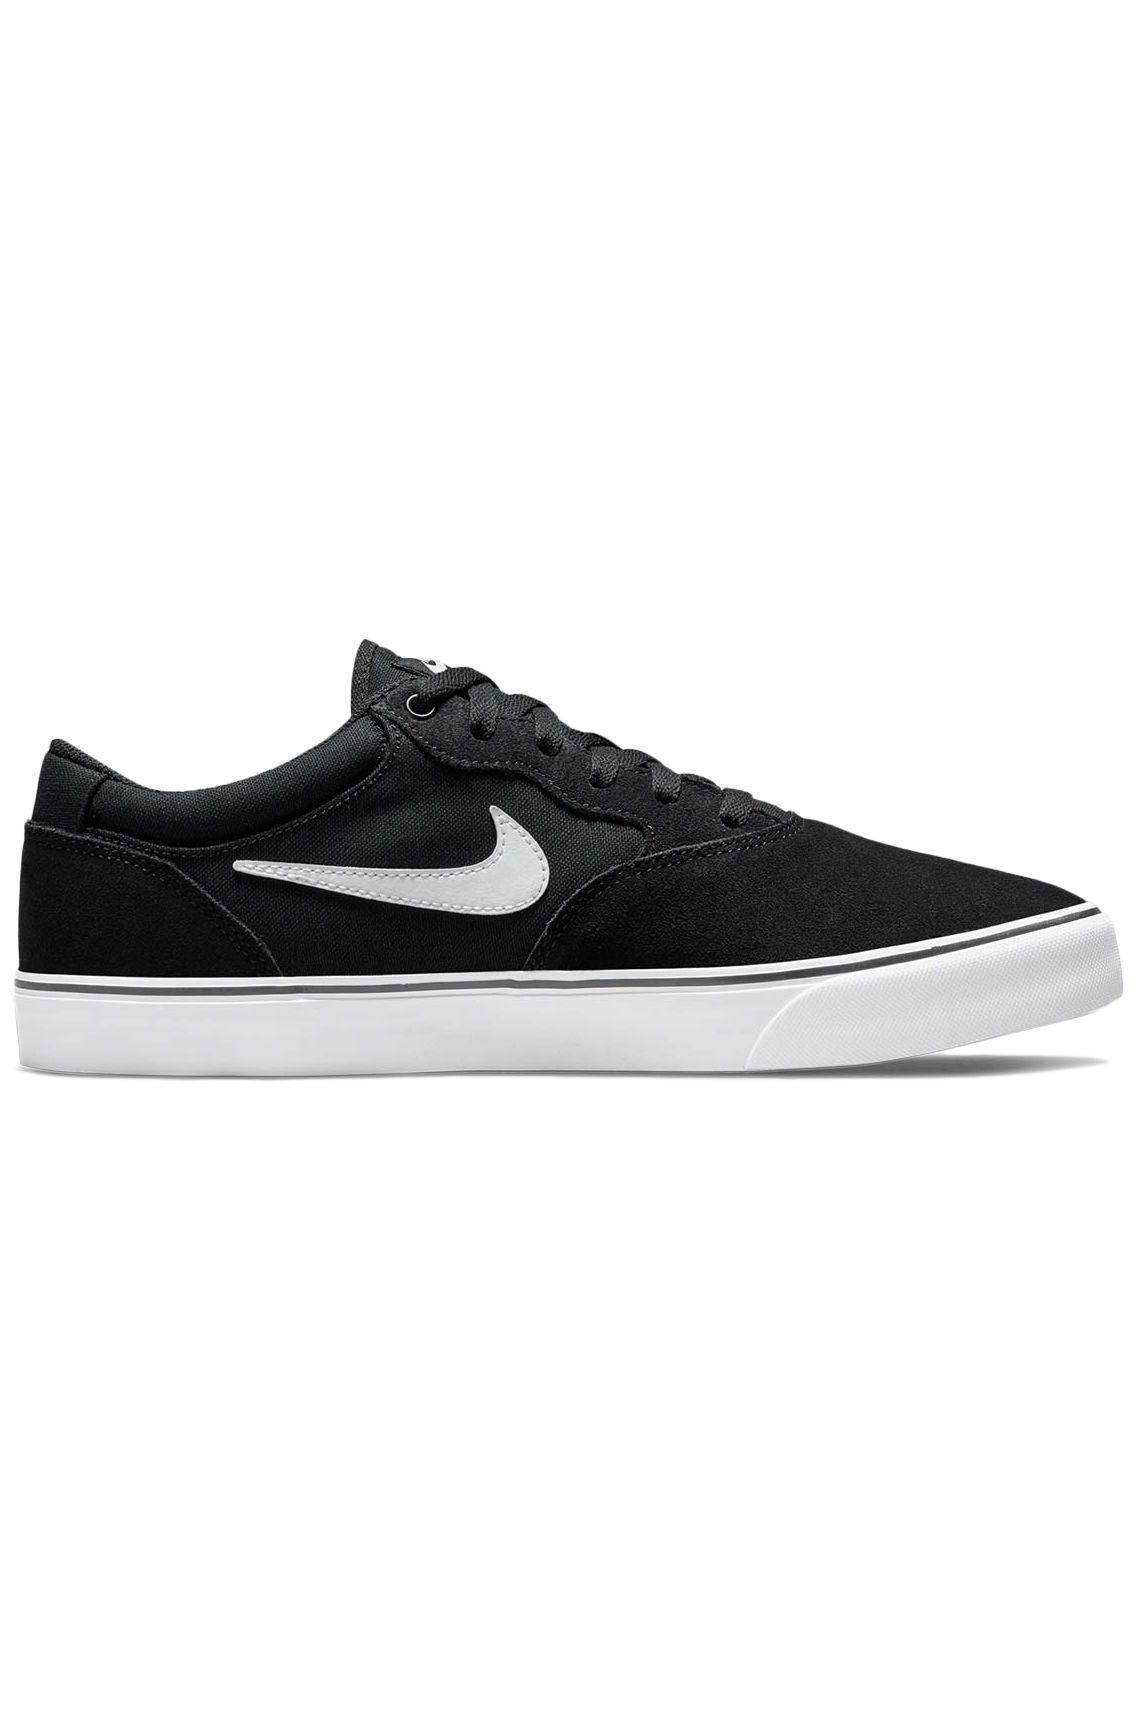 Nike Sb Shoes CHRON 2 Black/White-Black